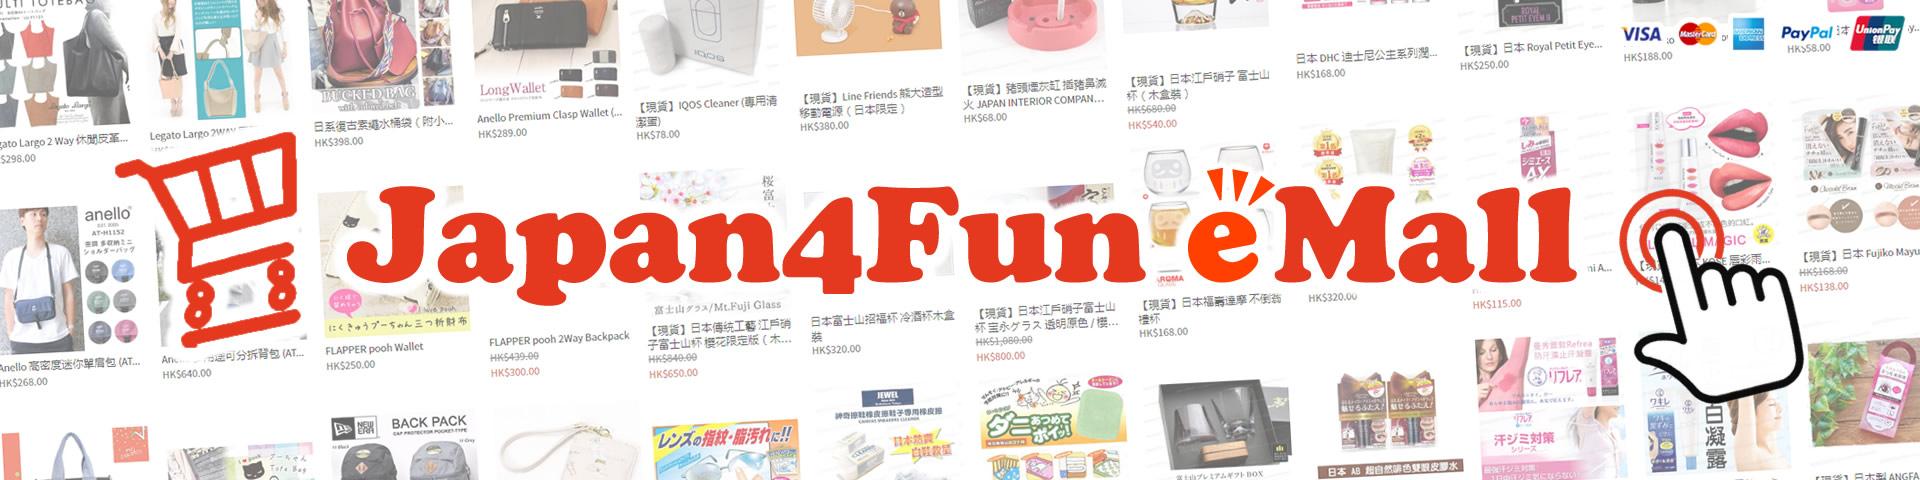 Japan4Fun